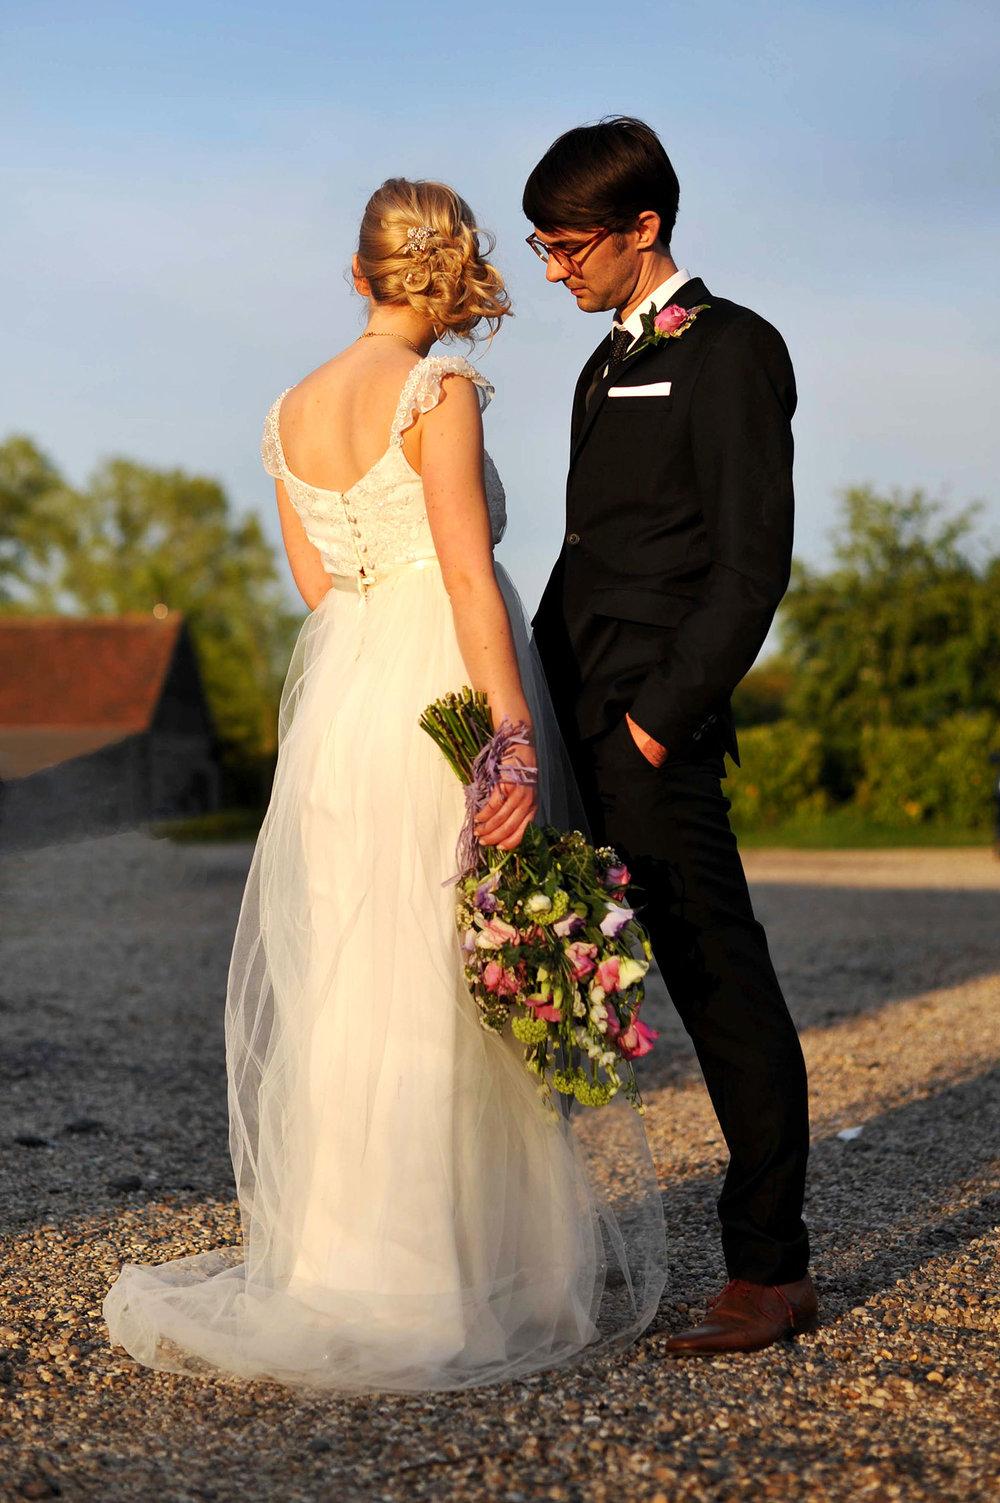 JMA-PHOTOGRAPHY-WEDDING-LEEDS-COUPLE-STANDING-IN-SUN.jpg